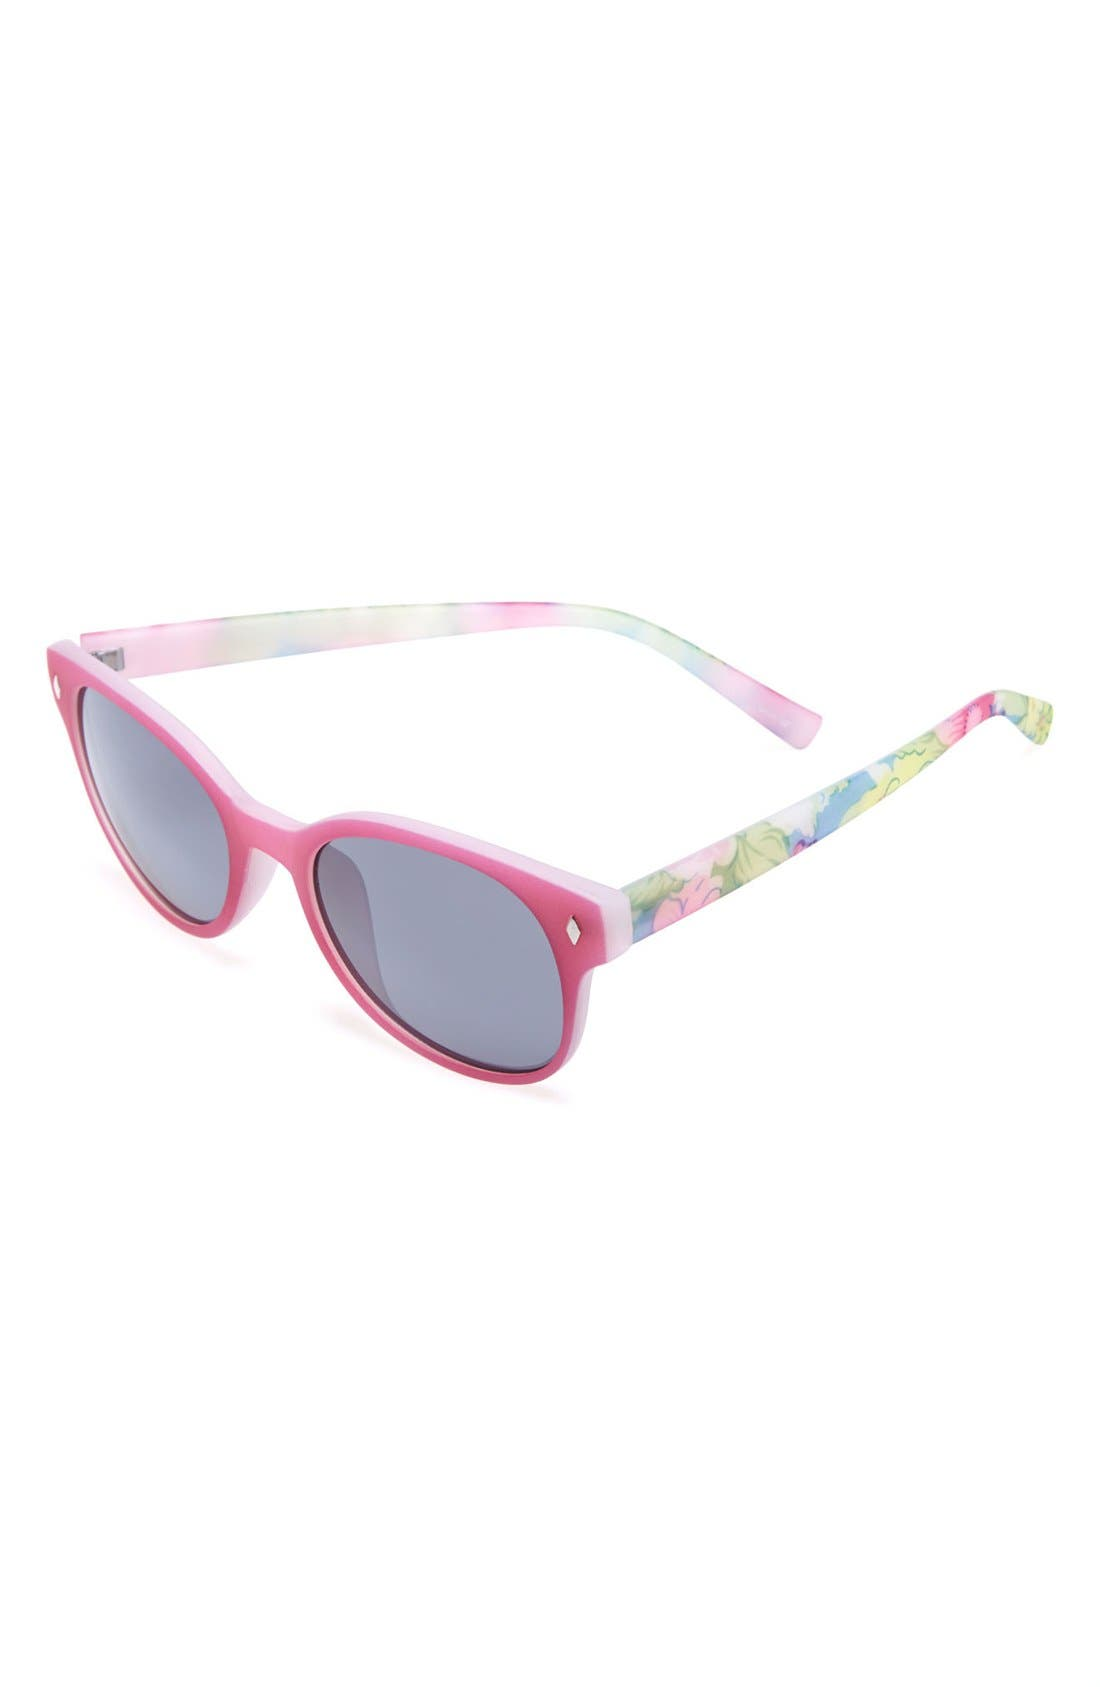 Main Image - Icon Eyewear Print Sunglasses (Girls)